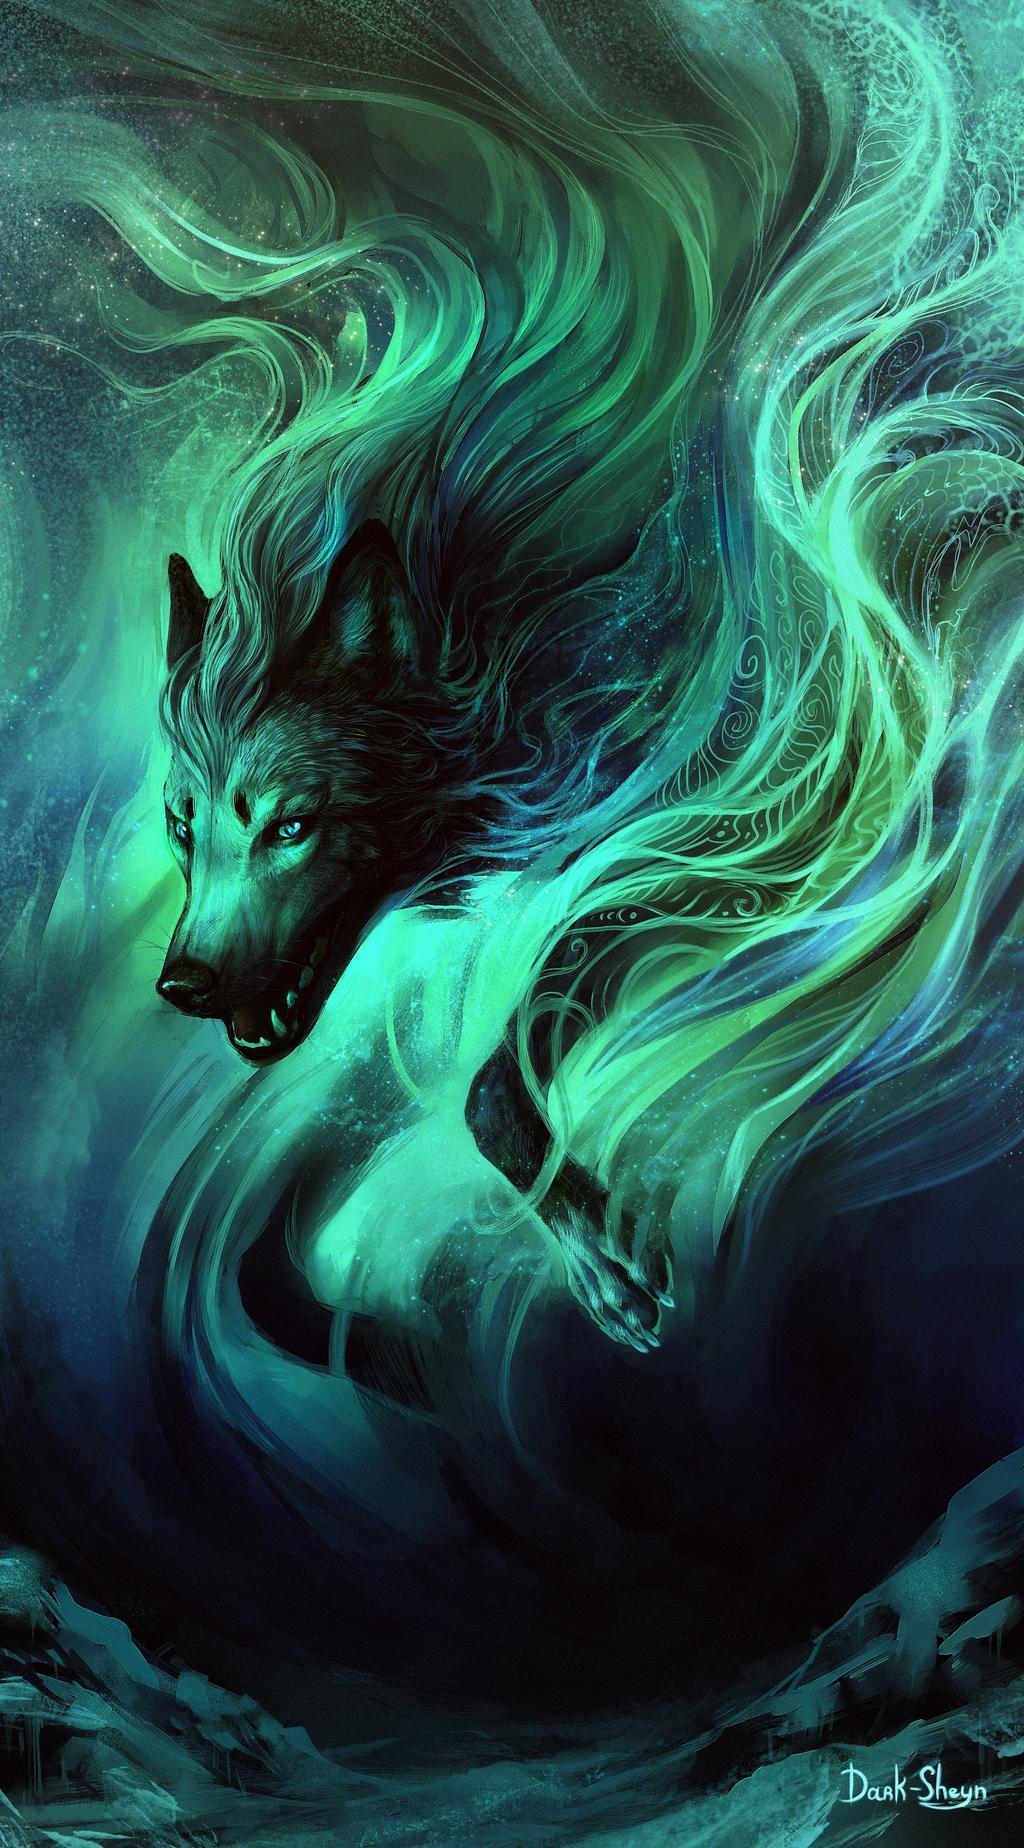 Photo of North Ghost by Dark-Sheyn on DeviantArt